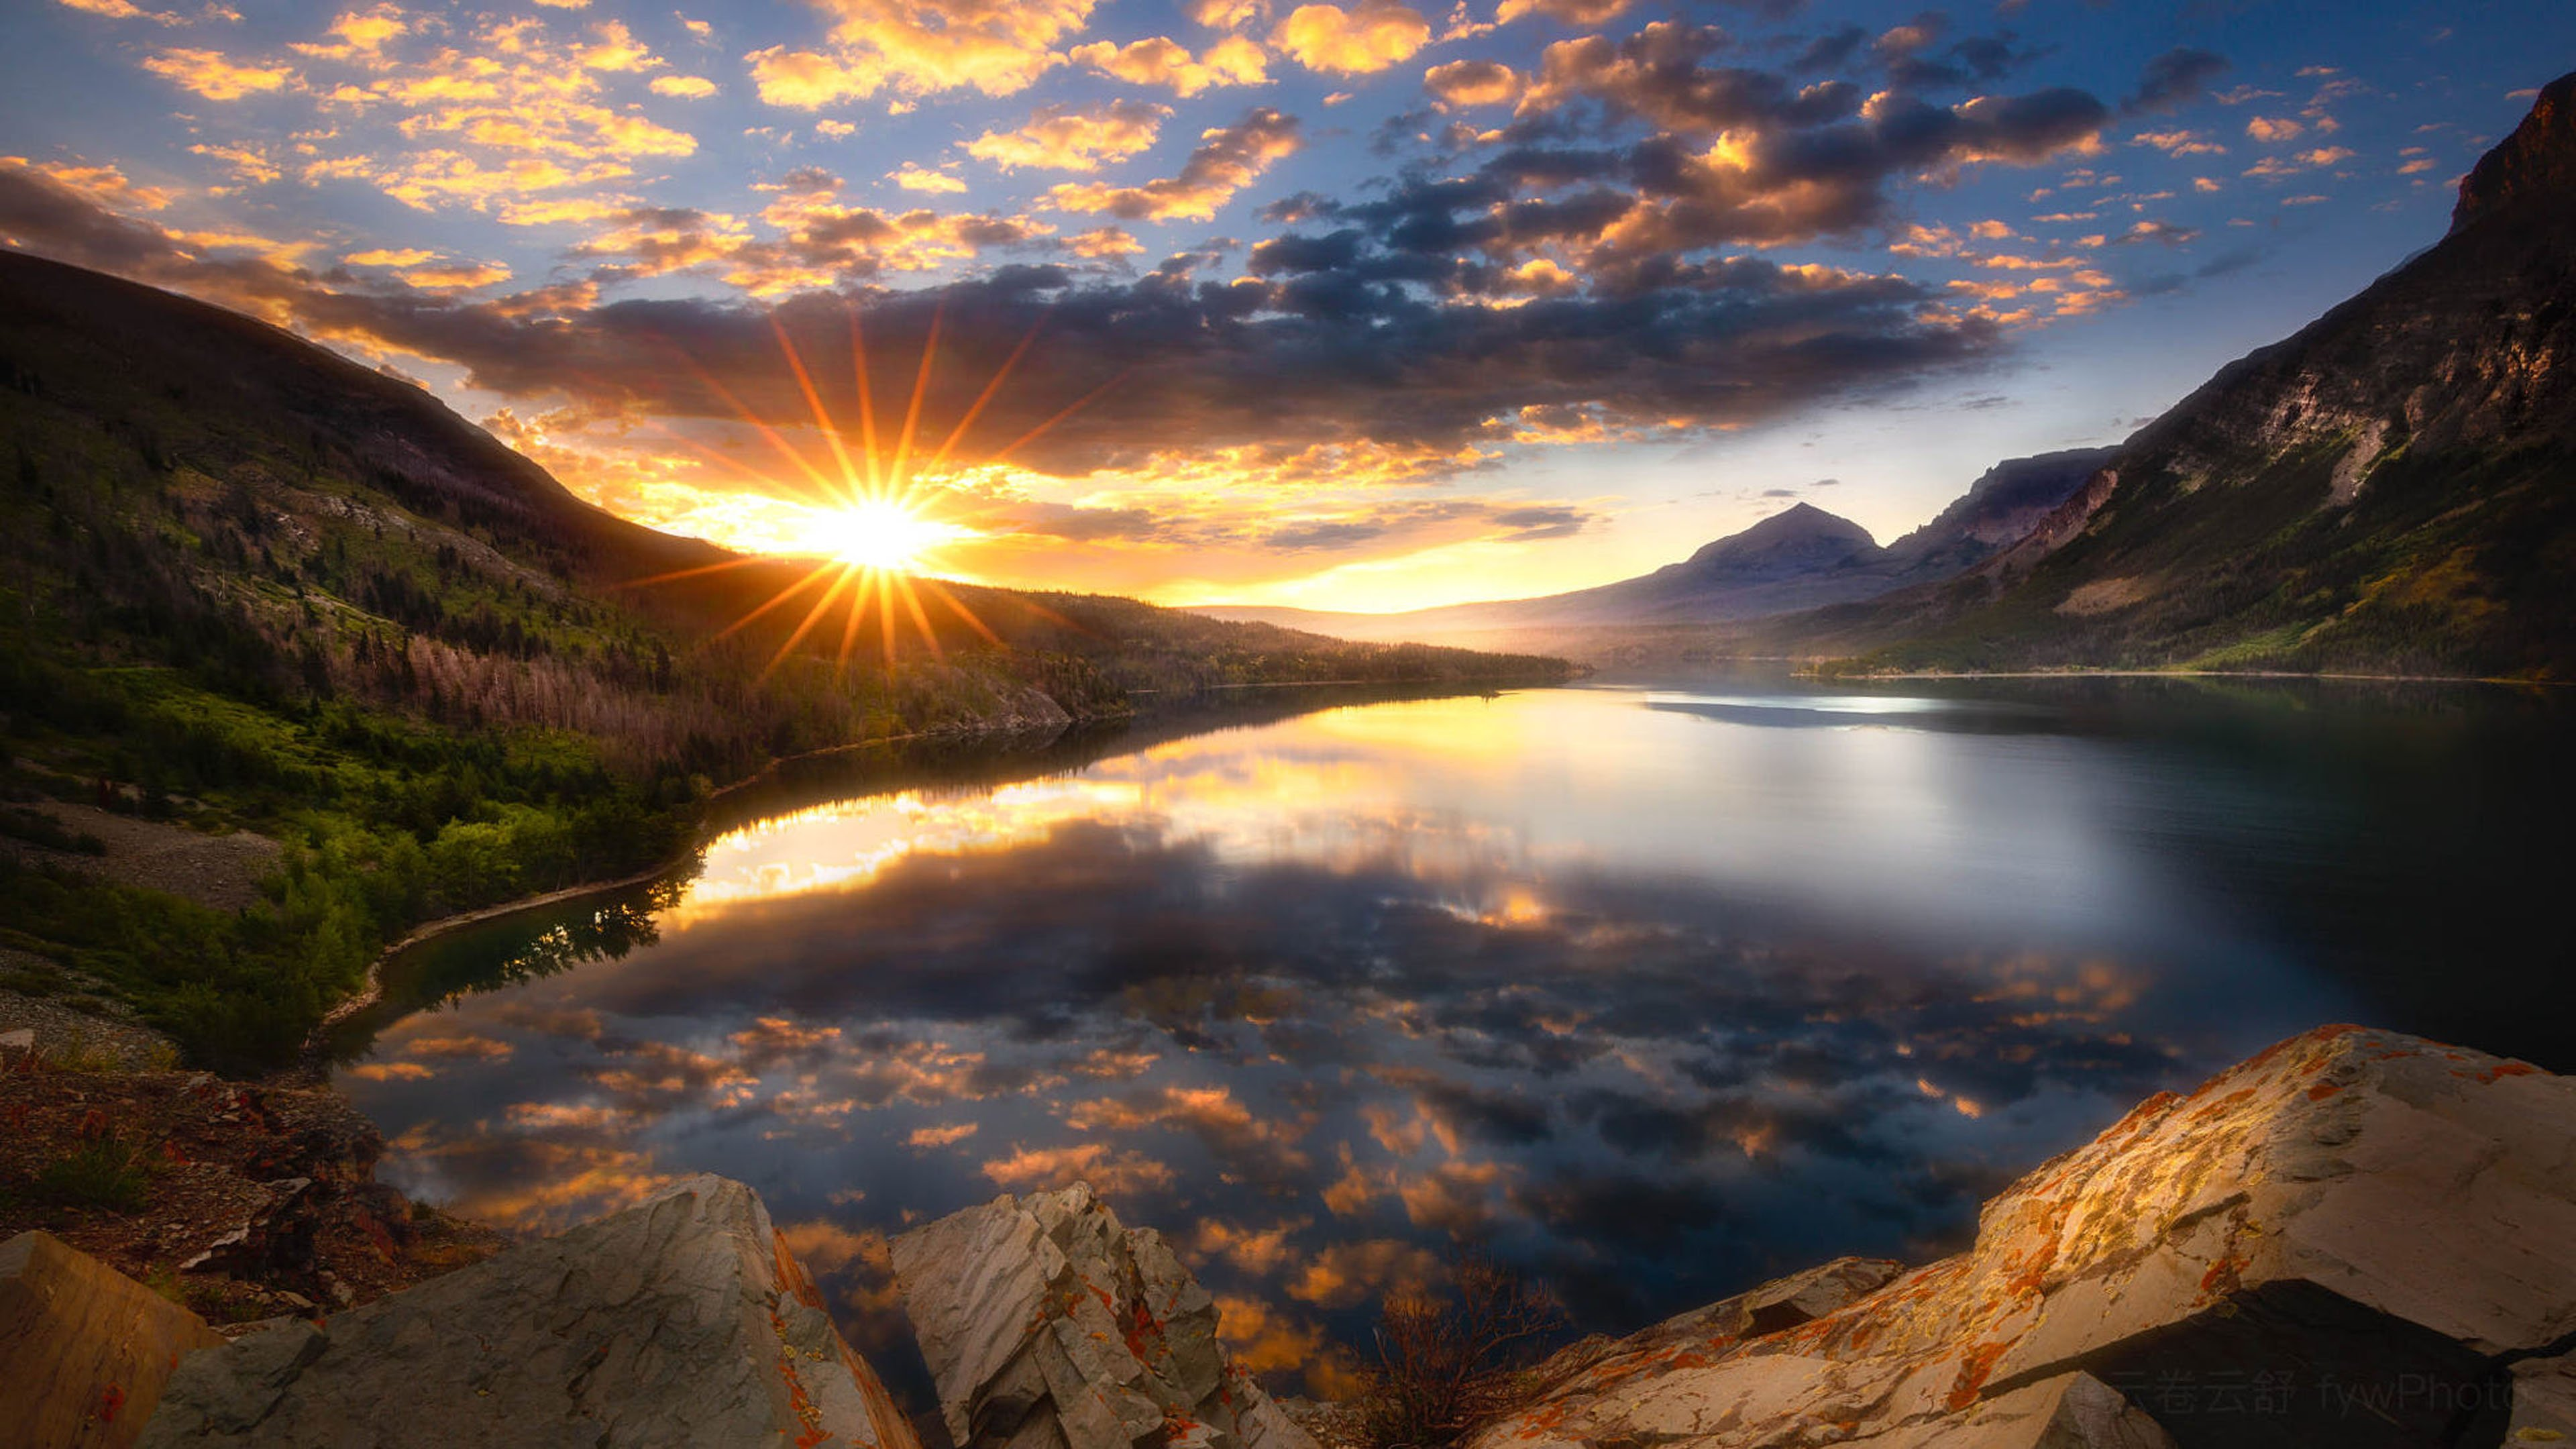 Saint Marys Lake Lake Montana Glacier National Park Sunrise 3840x2160